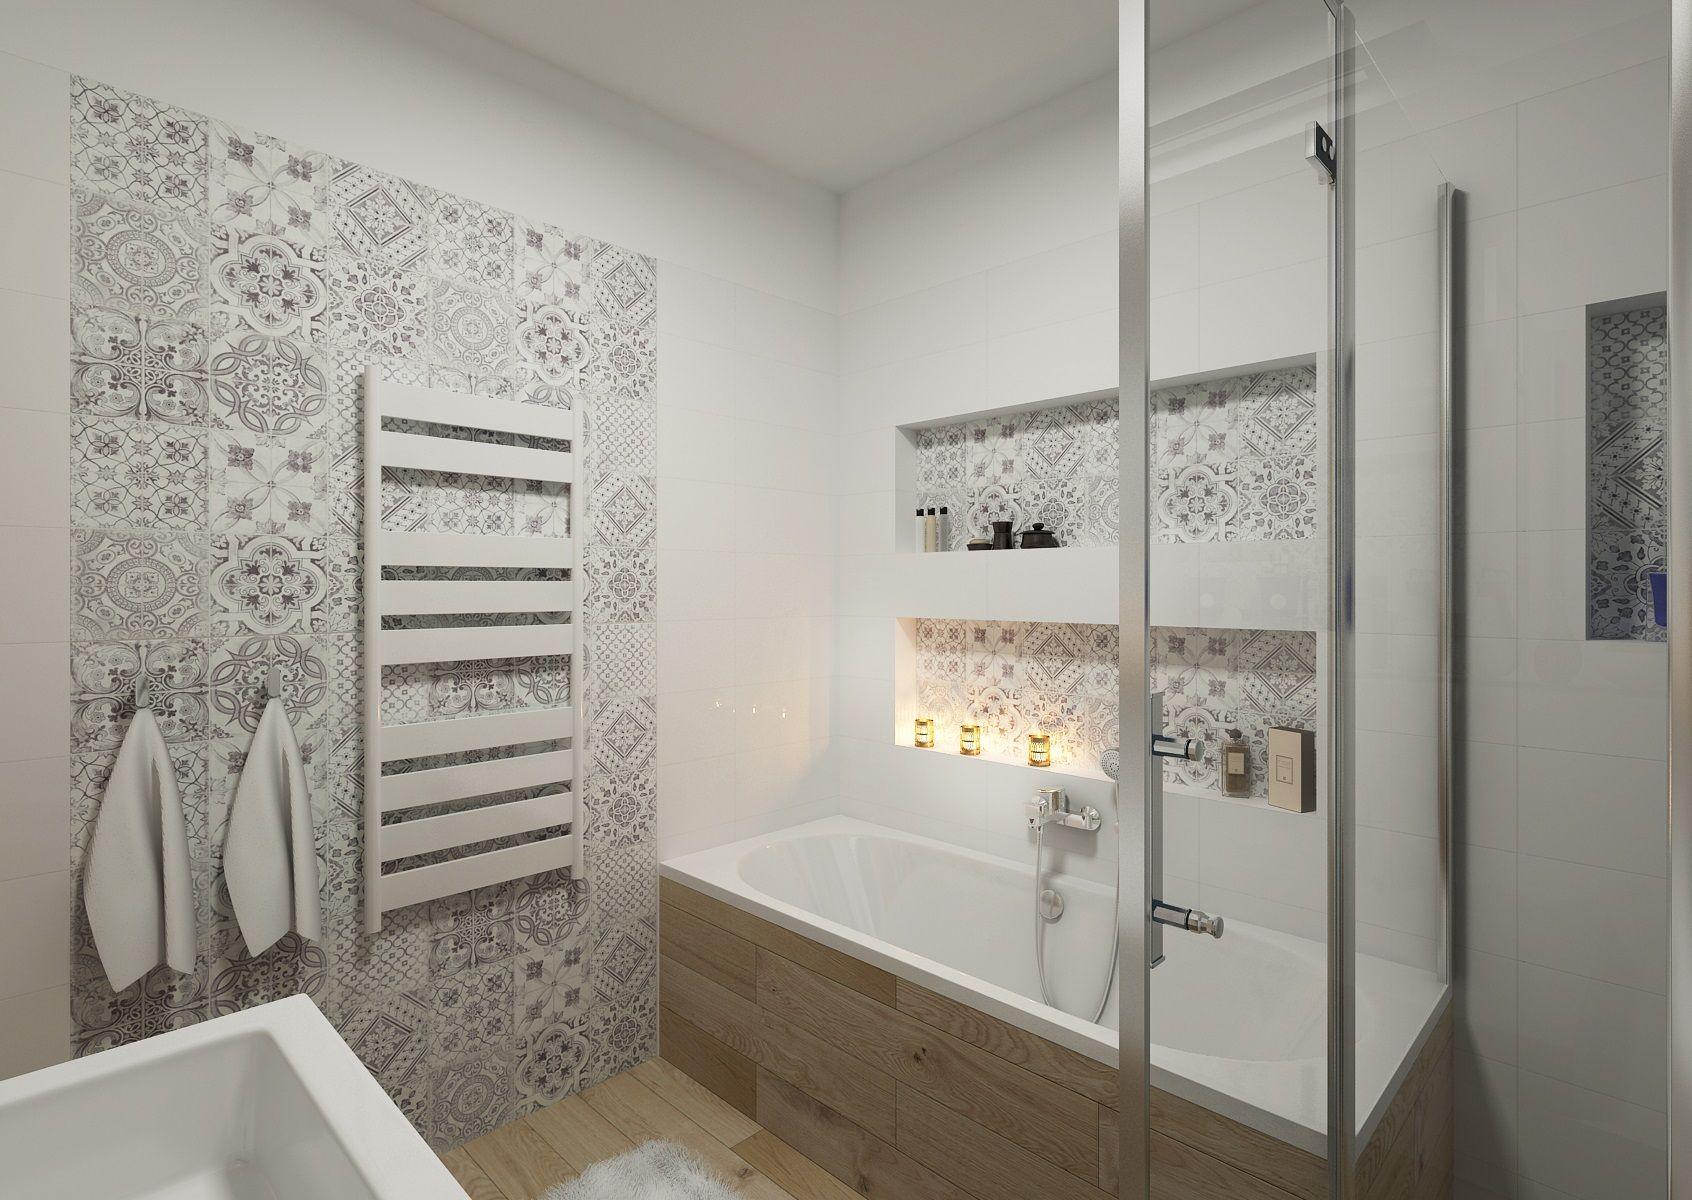 Recouvrir Frise Carrelage Salle De Bain návrhy koupelen | aŤÁk design | idée salle de bain, salle de